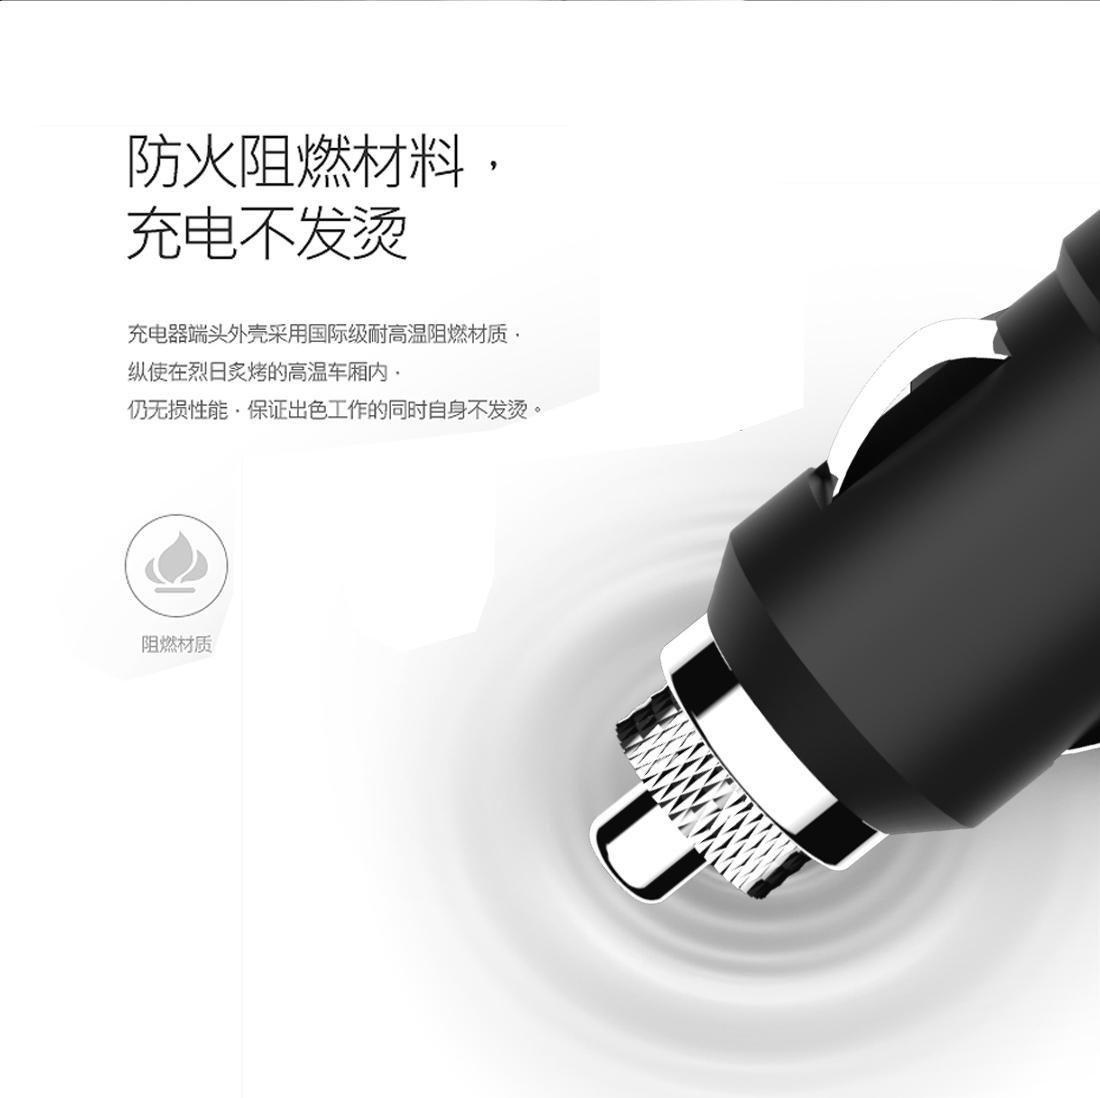 YC05  杯架车载充电器